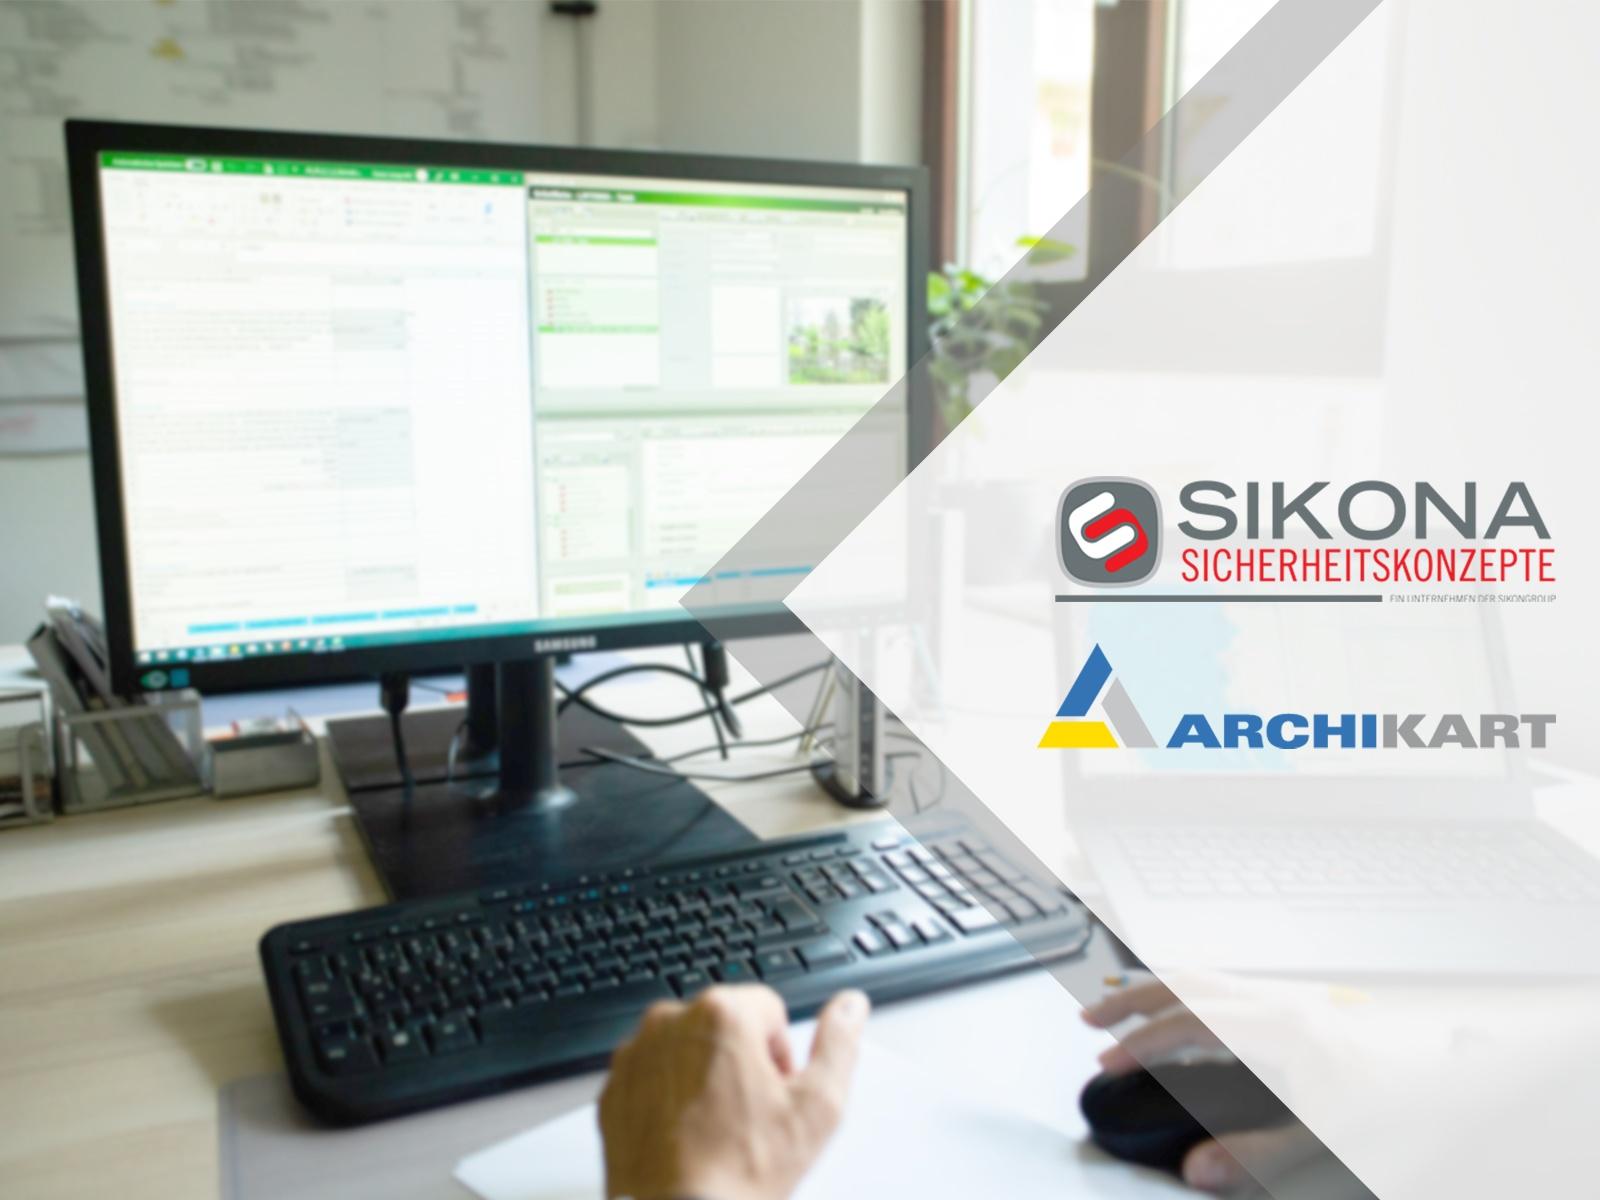 Archikart_Sikona